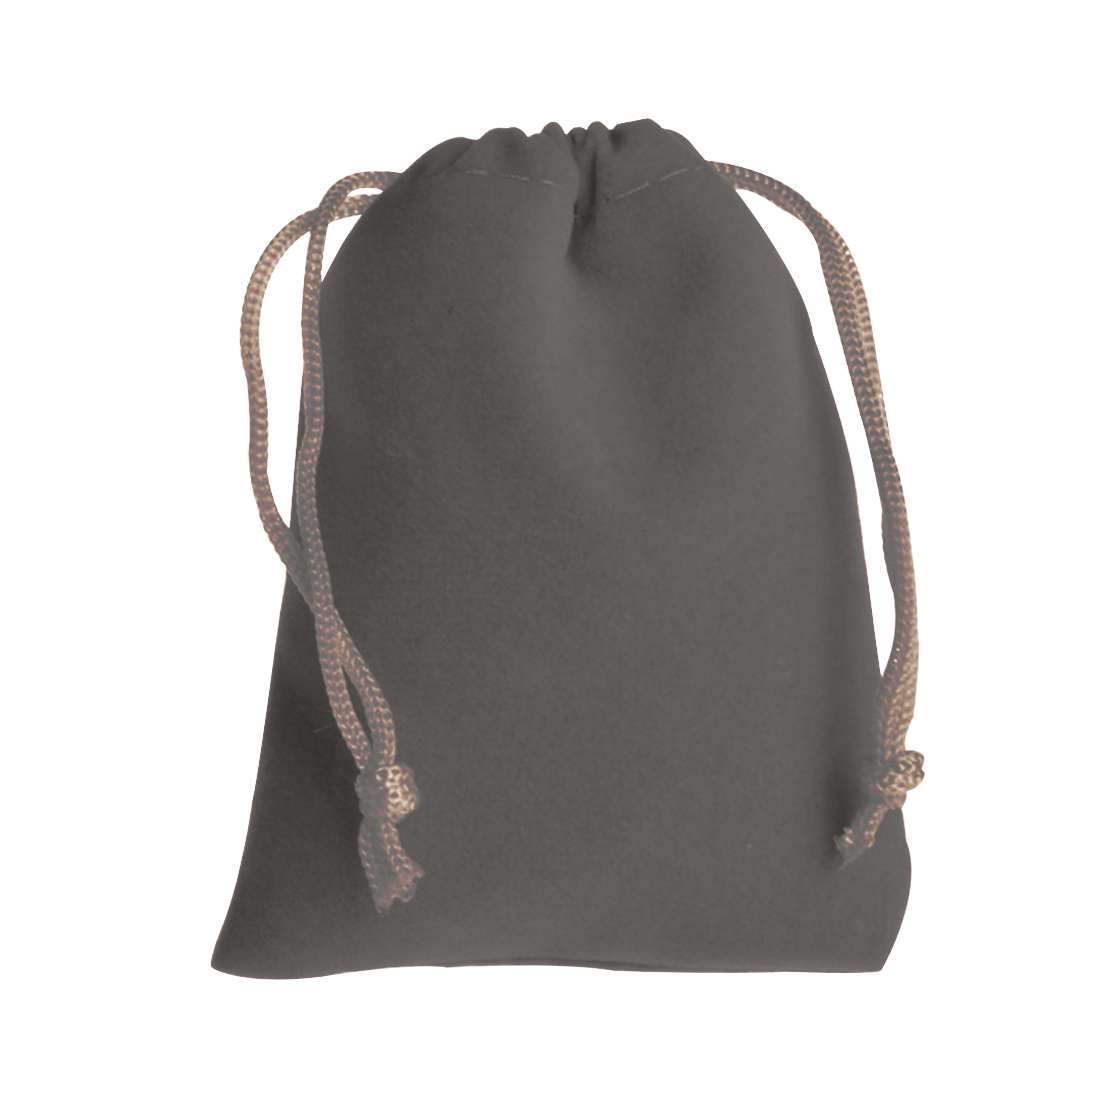 2e655ddab Etmakit Pouch Bag For iPhone X 8 7 Case Samsung Mobile Phone Cellphones